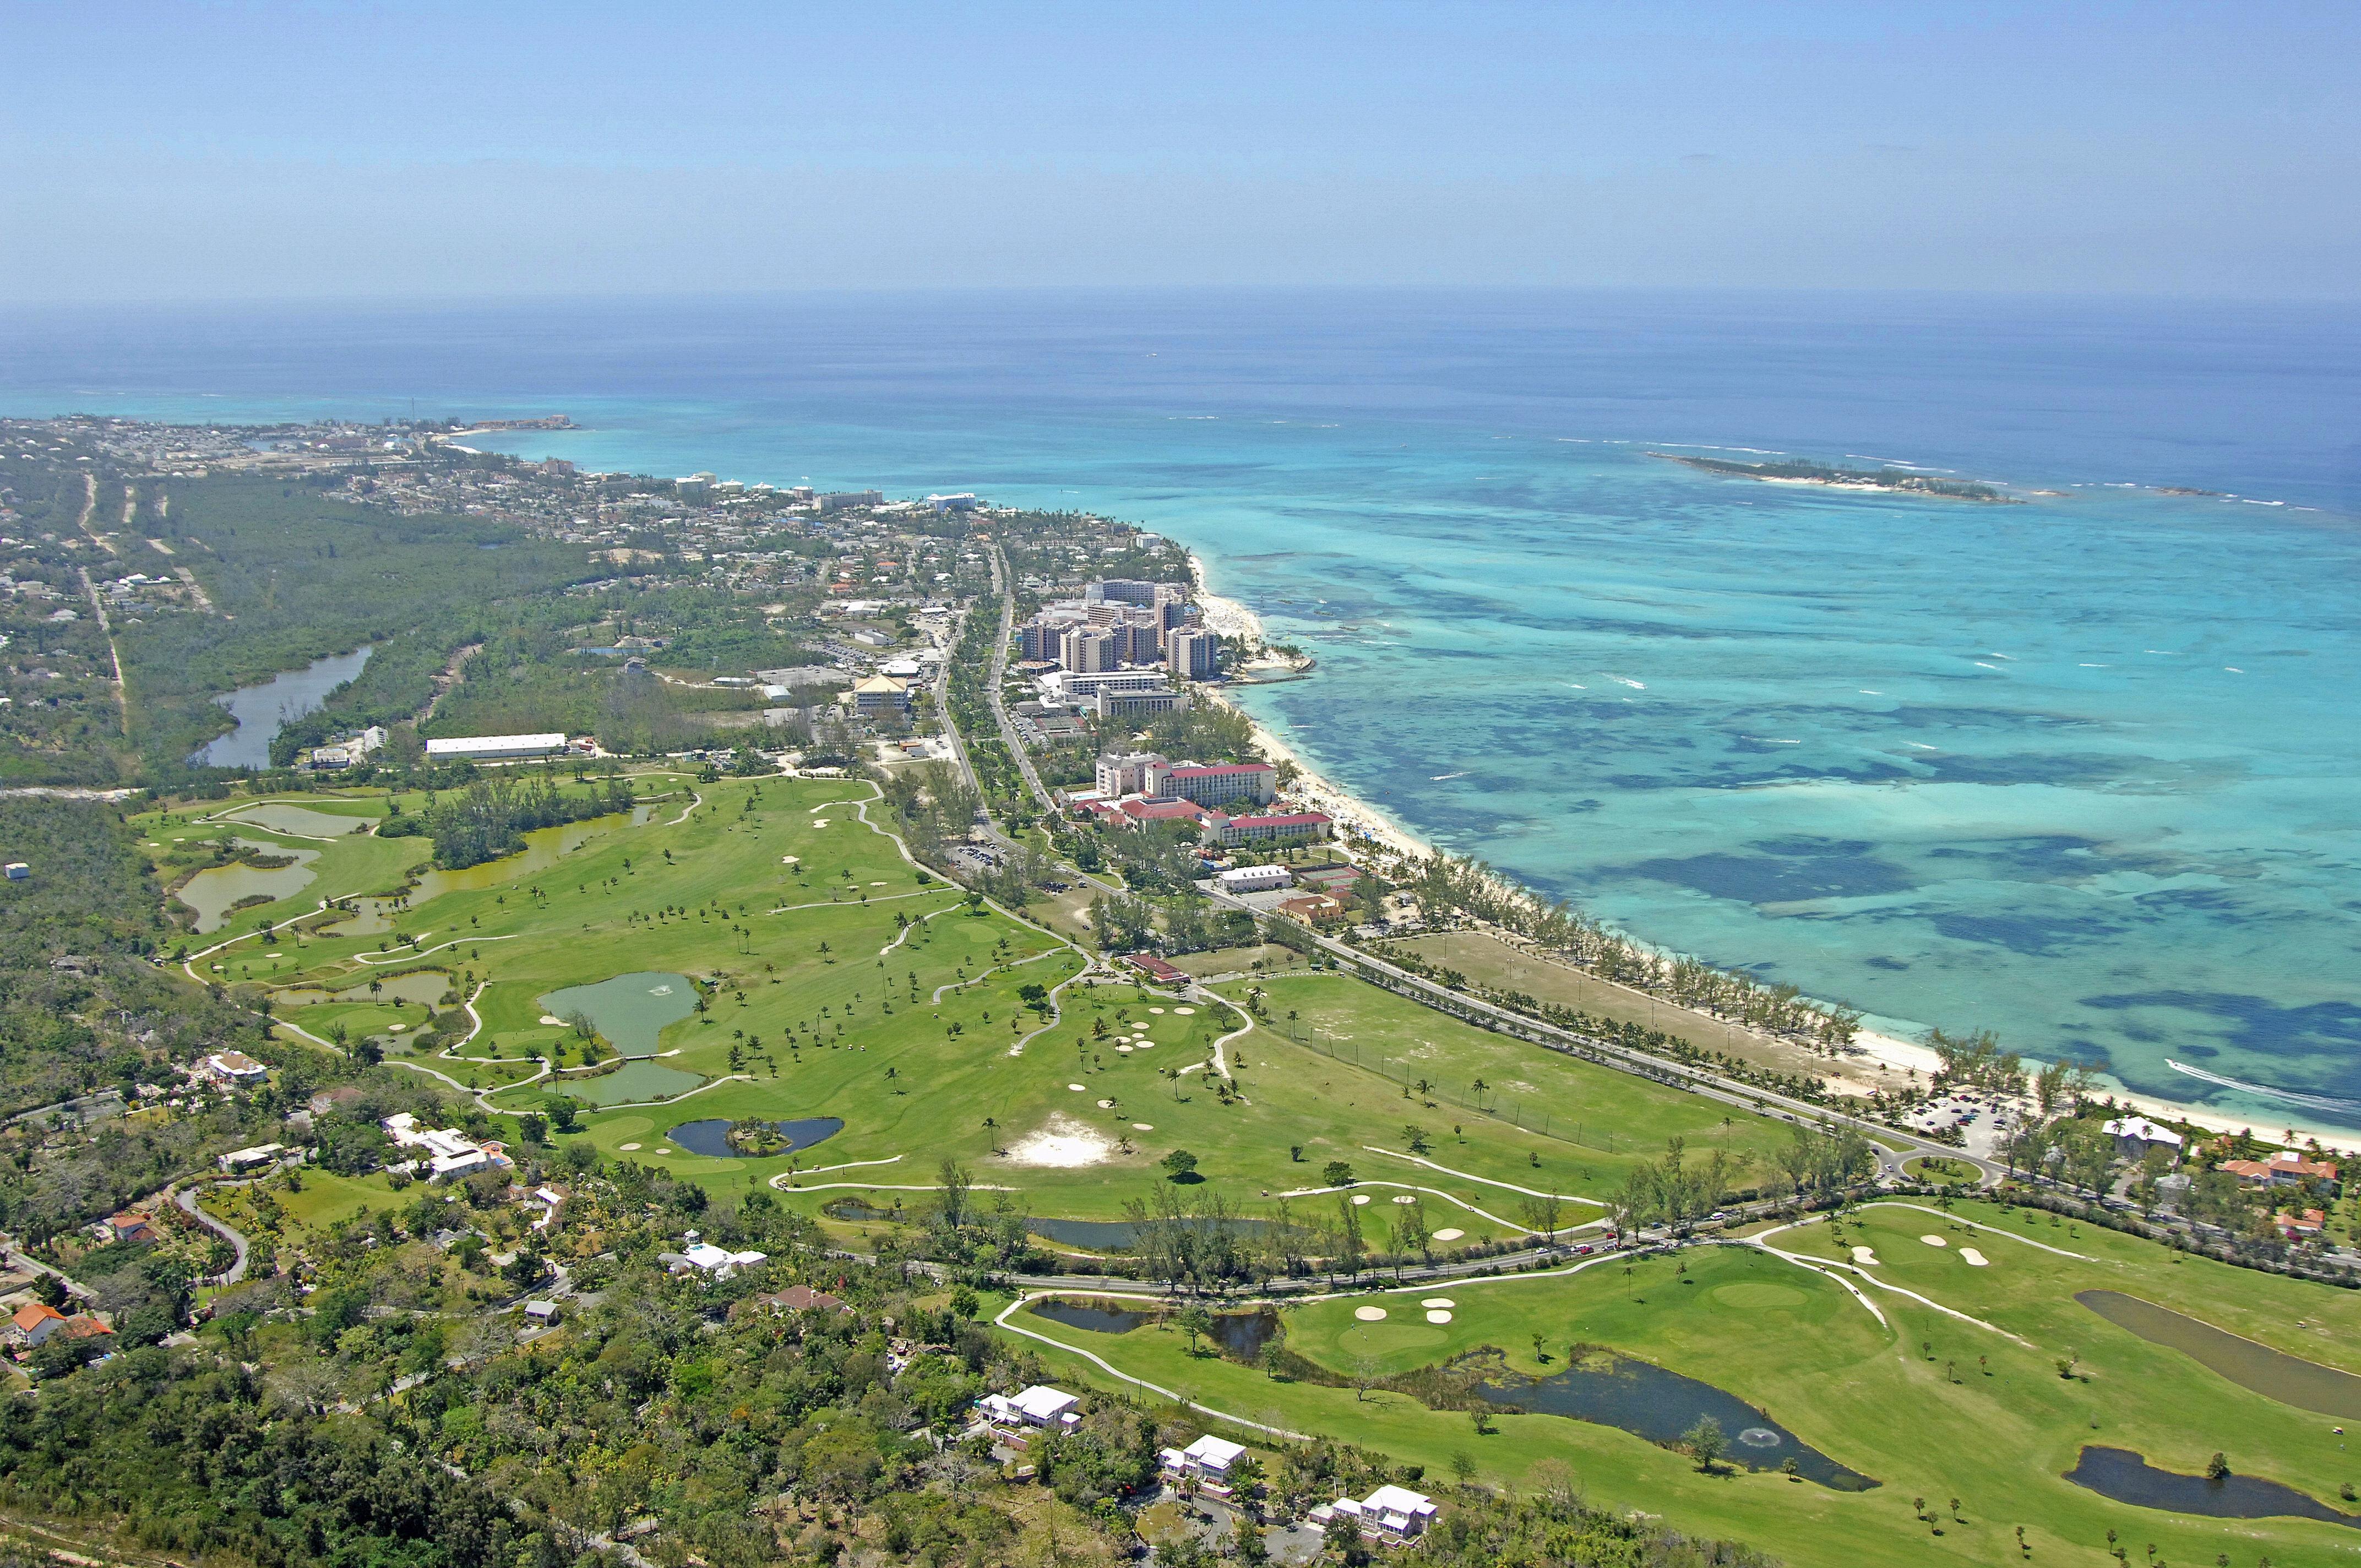 the bahamas descriptive Definition of descriptive - serving or seeking to describe, describing or classifying in an objective and non-judgemental way.